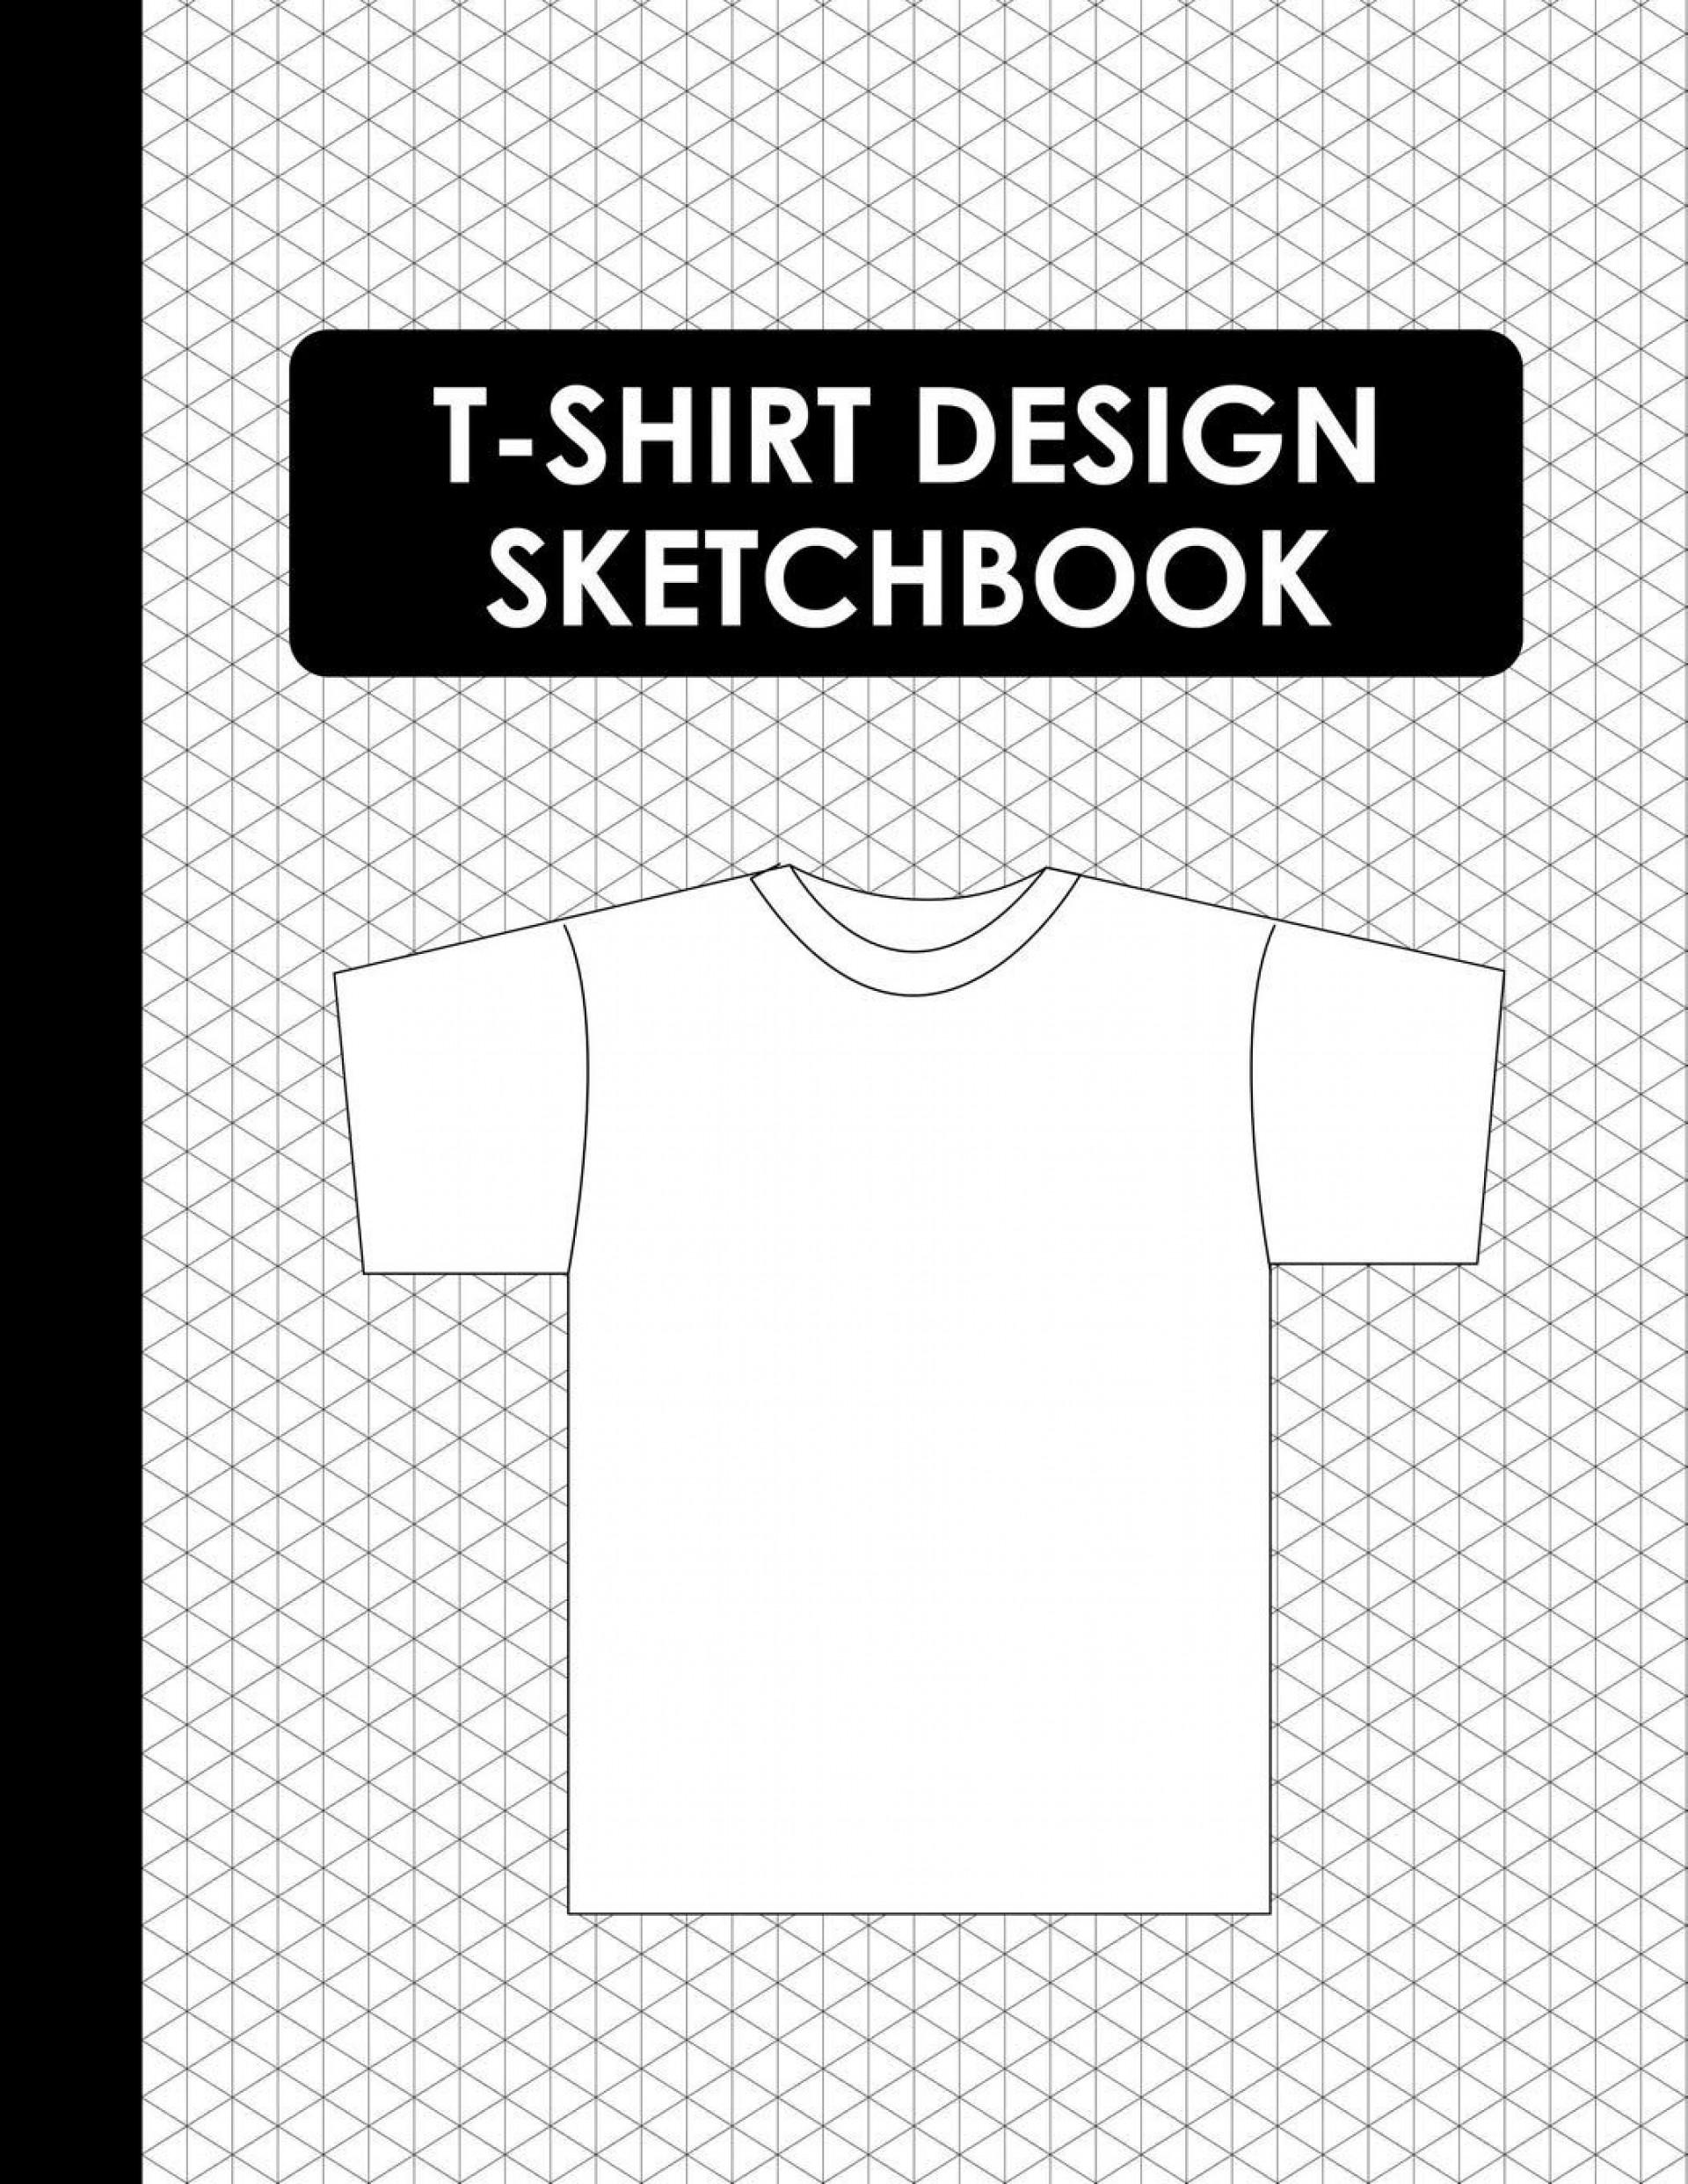 004 Unique T Shirt Template Design Picture  Psd Free Download Editable1920